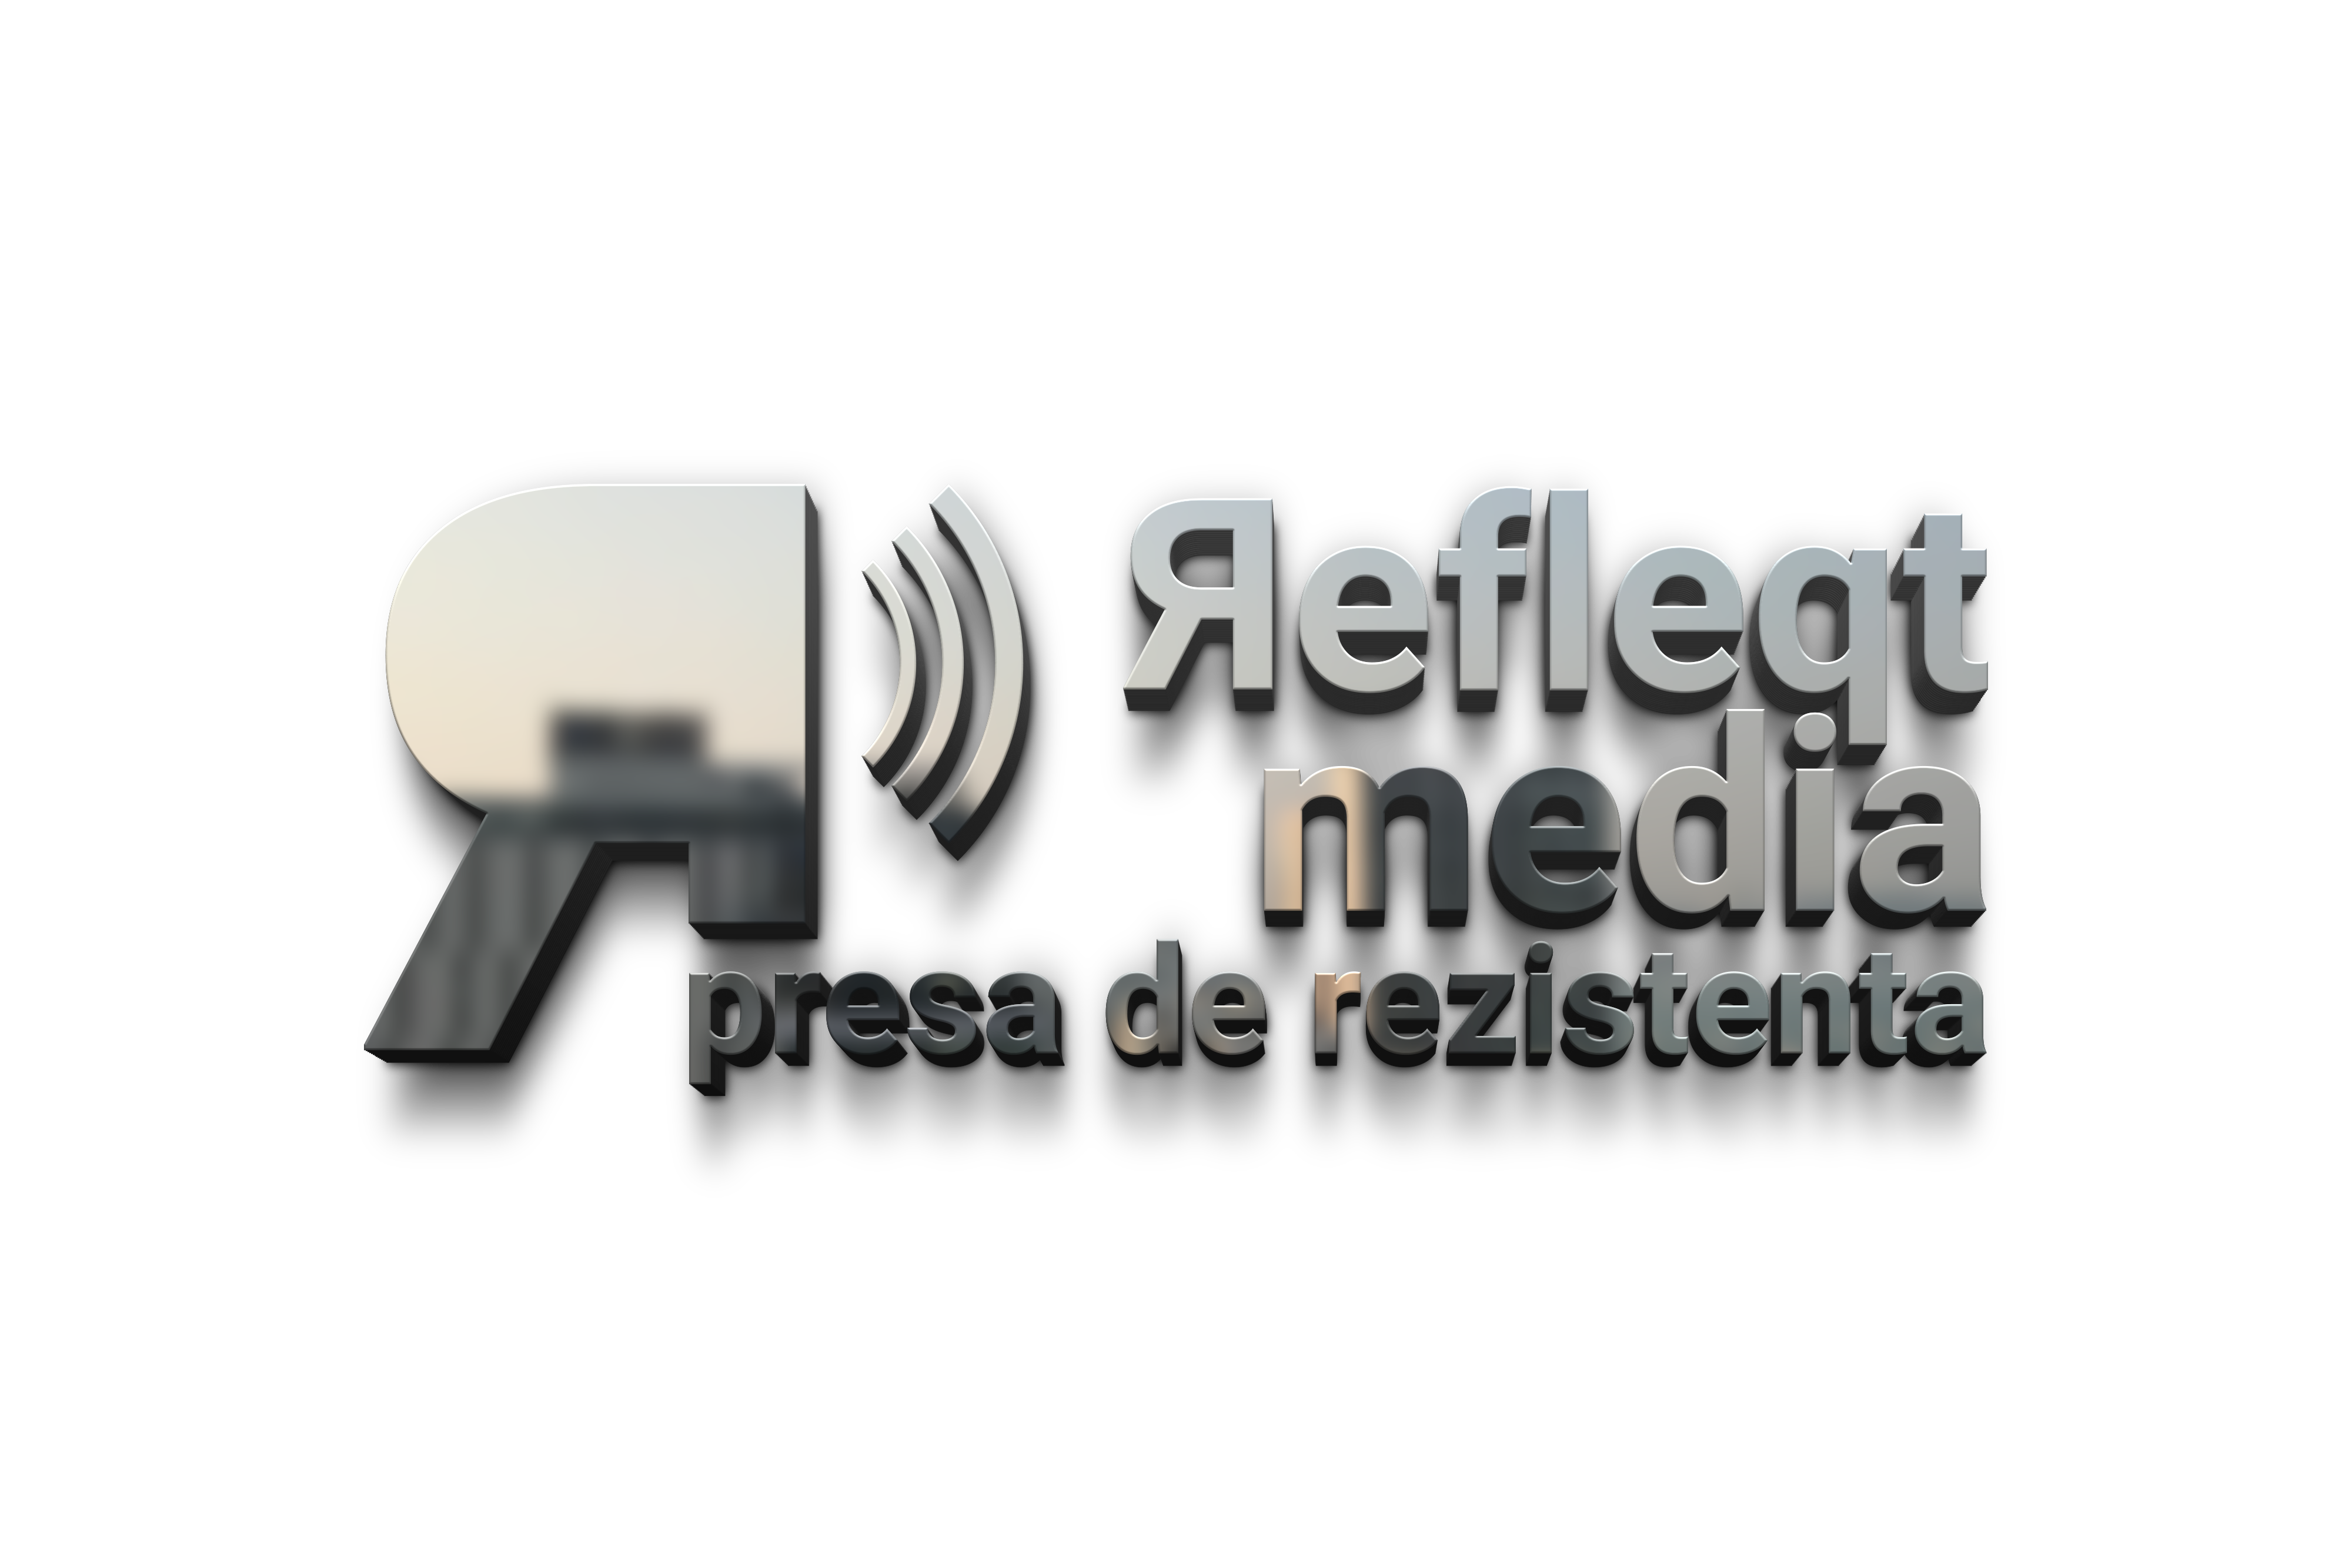 RefleqtMedia